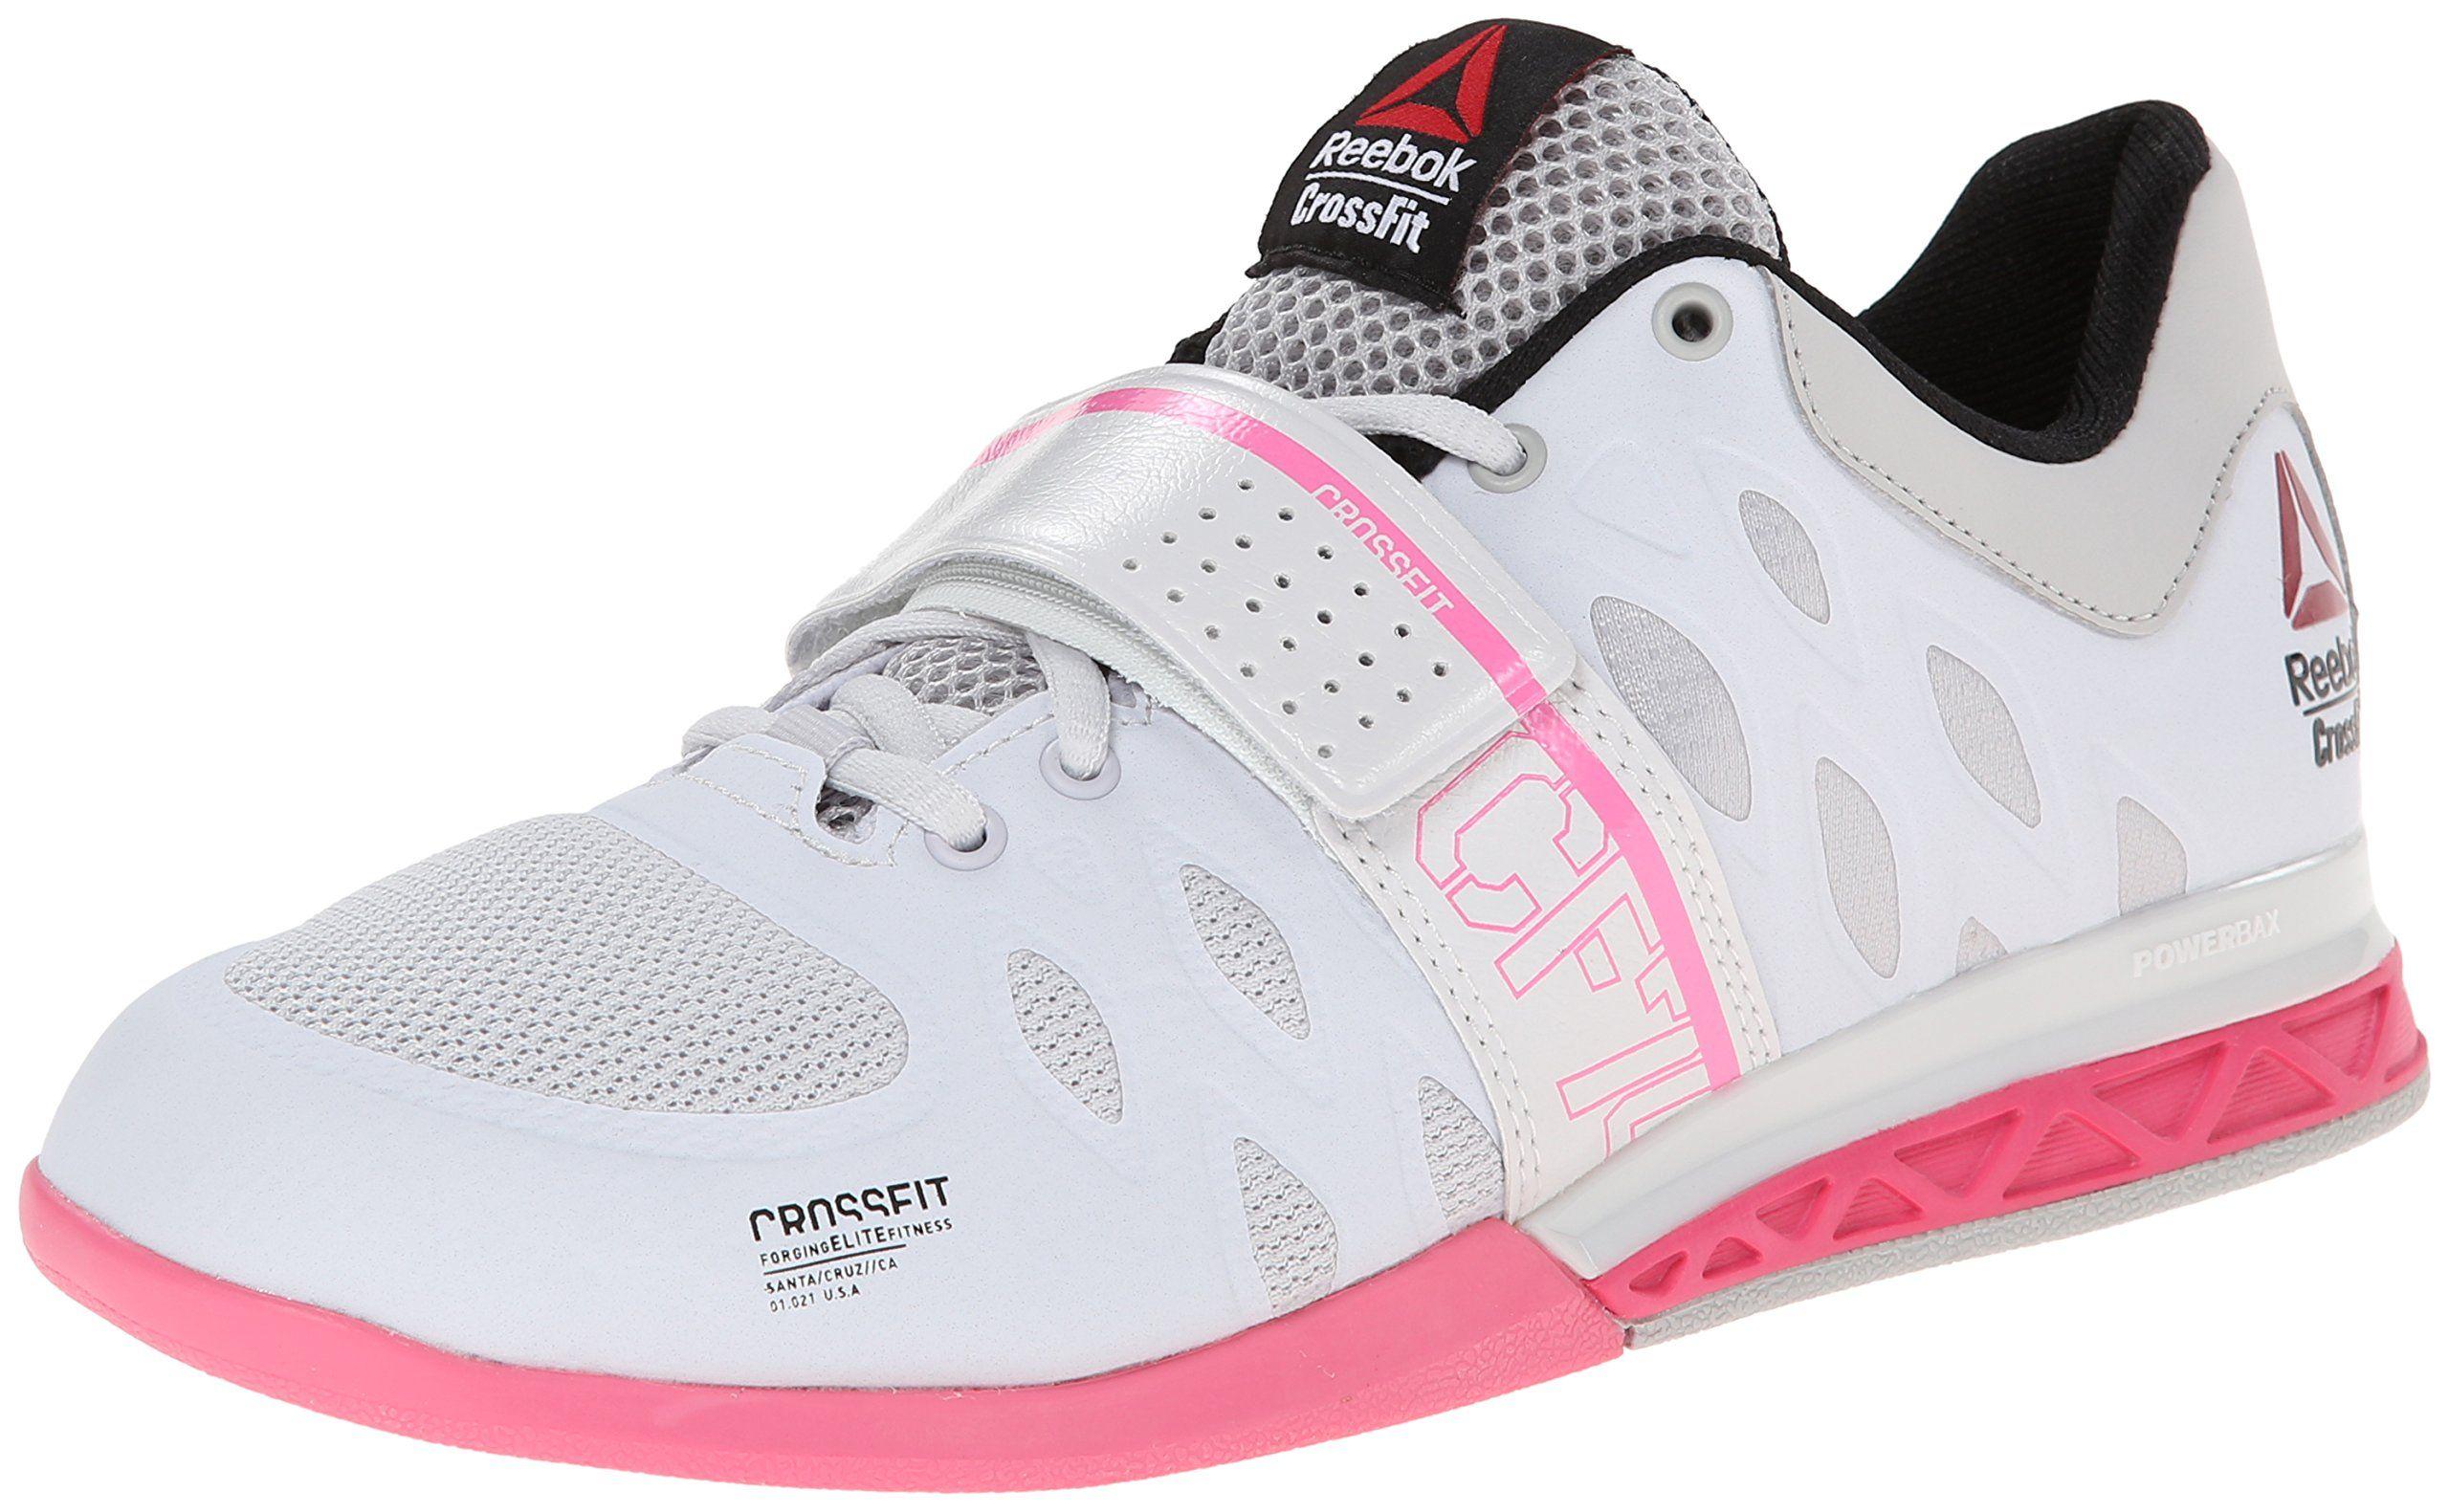 7797a044f4fde Amazon.com: Reebok Women's Crossfit Lifter 2.0 Training Shoe: Shoes ...